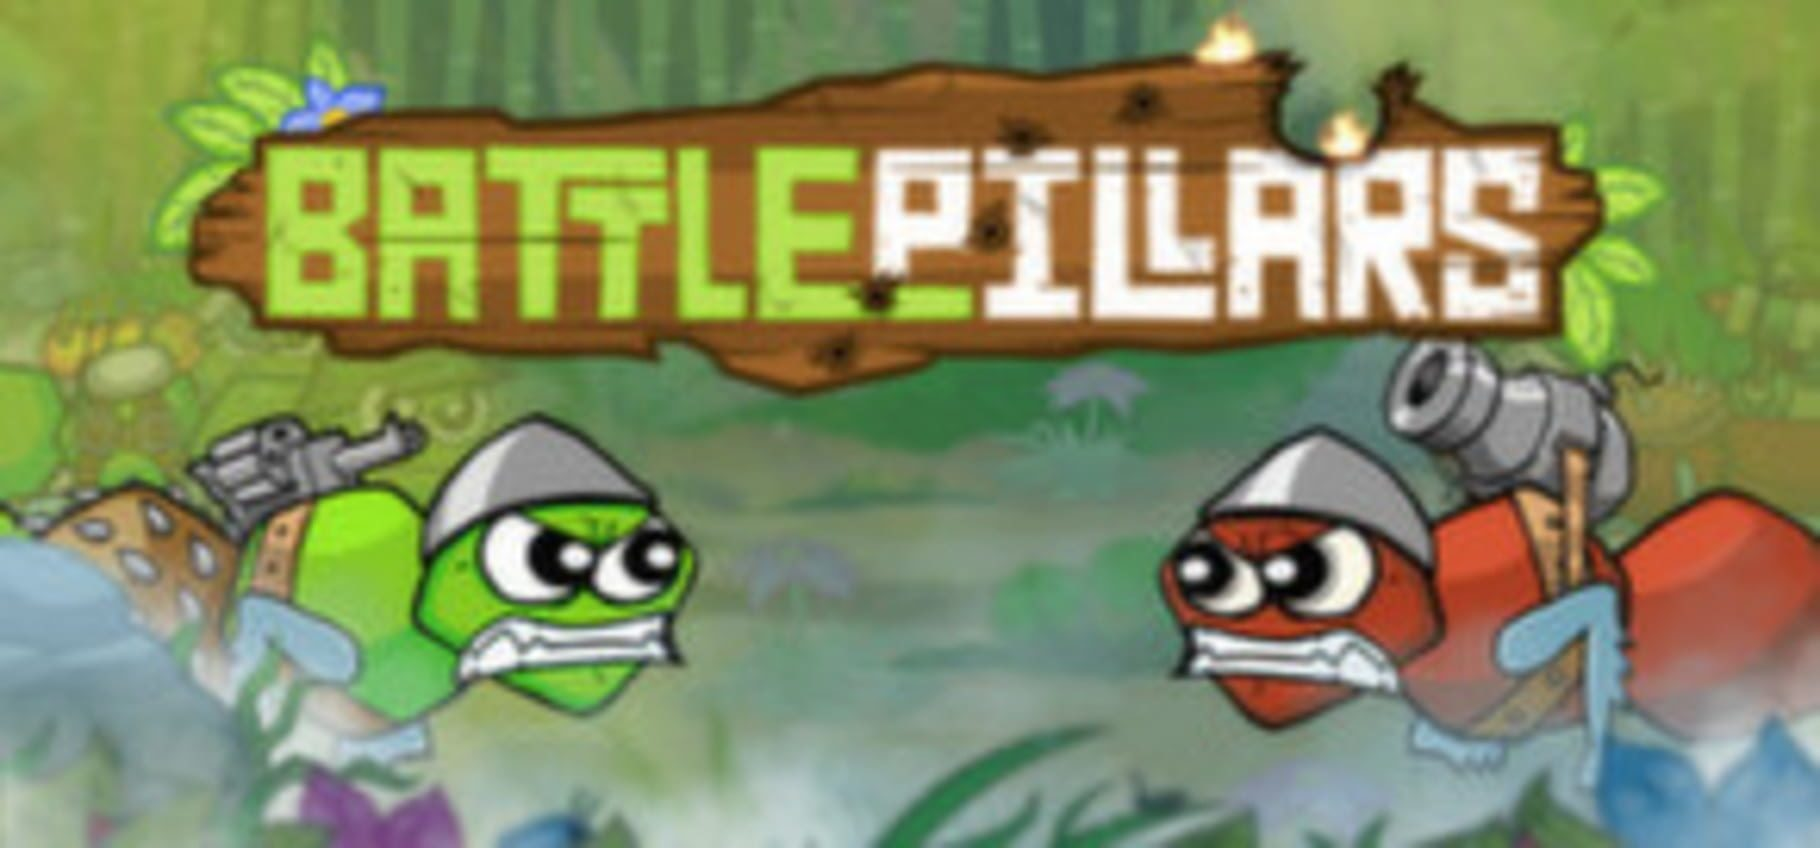 buy Battlepillars cd key for all platform